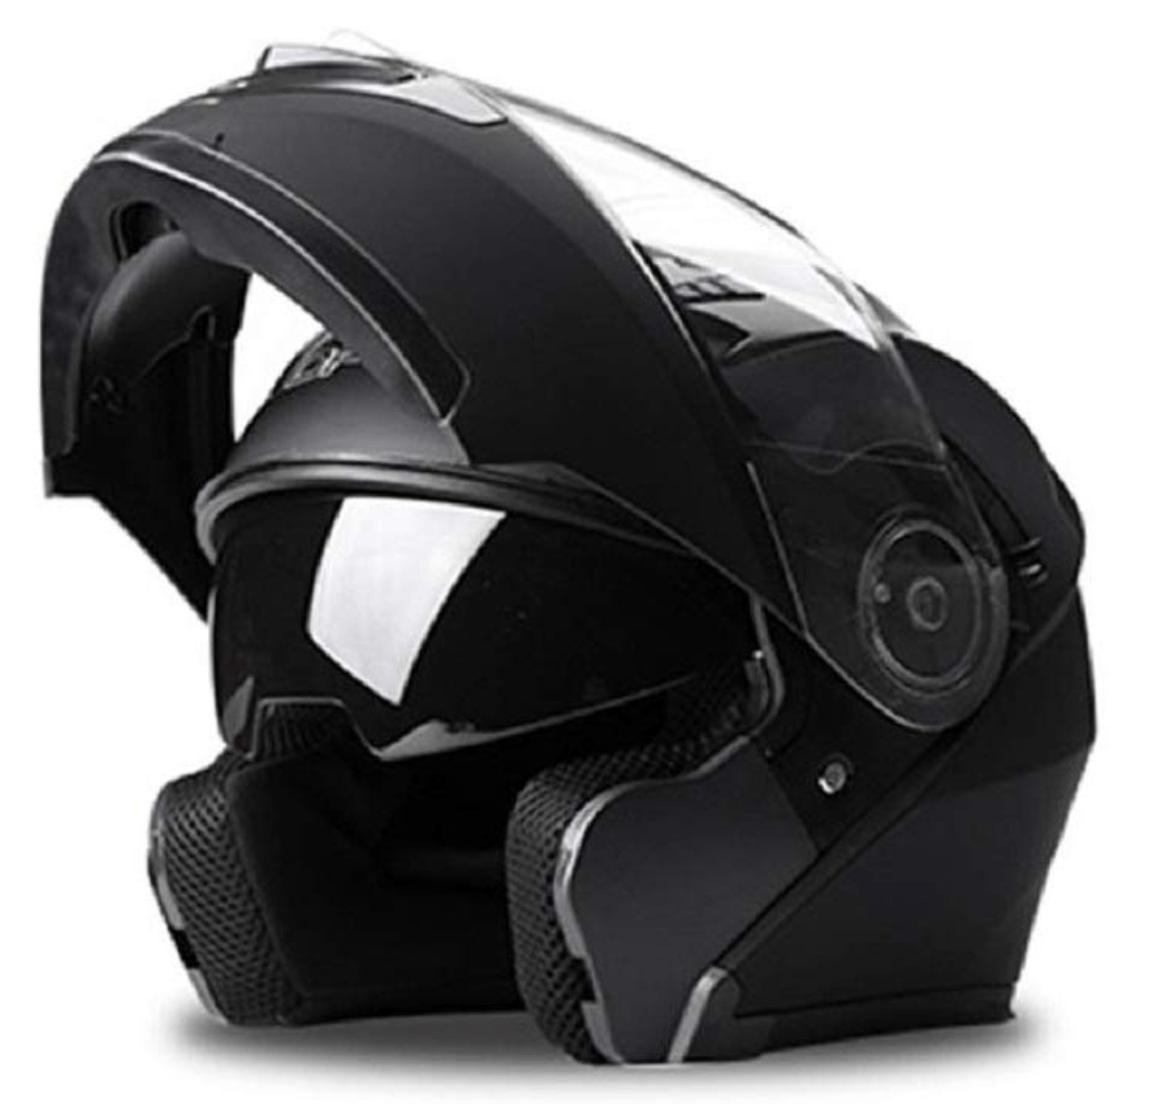 GOHAN ジェットヘルメット フルフェース 透明シールド